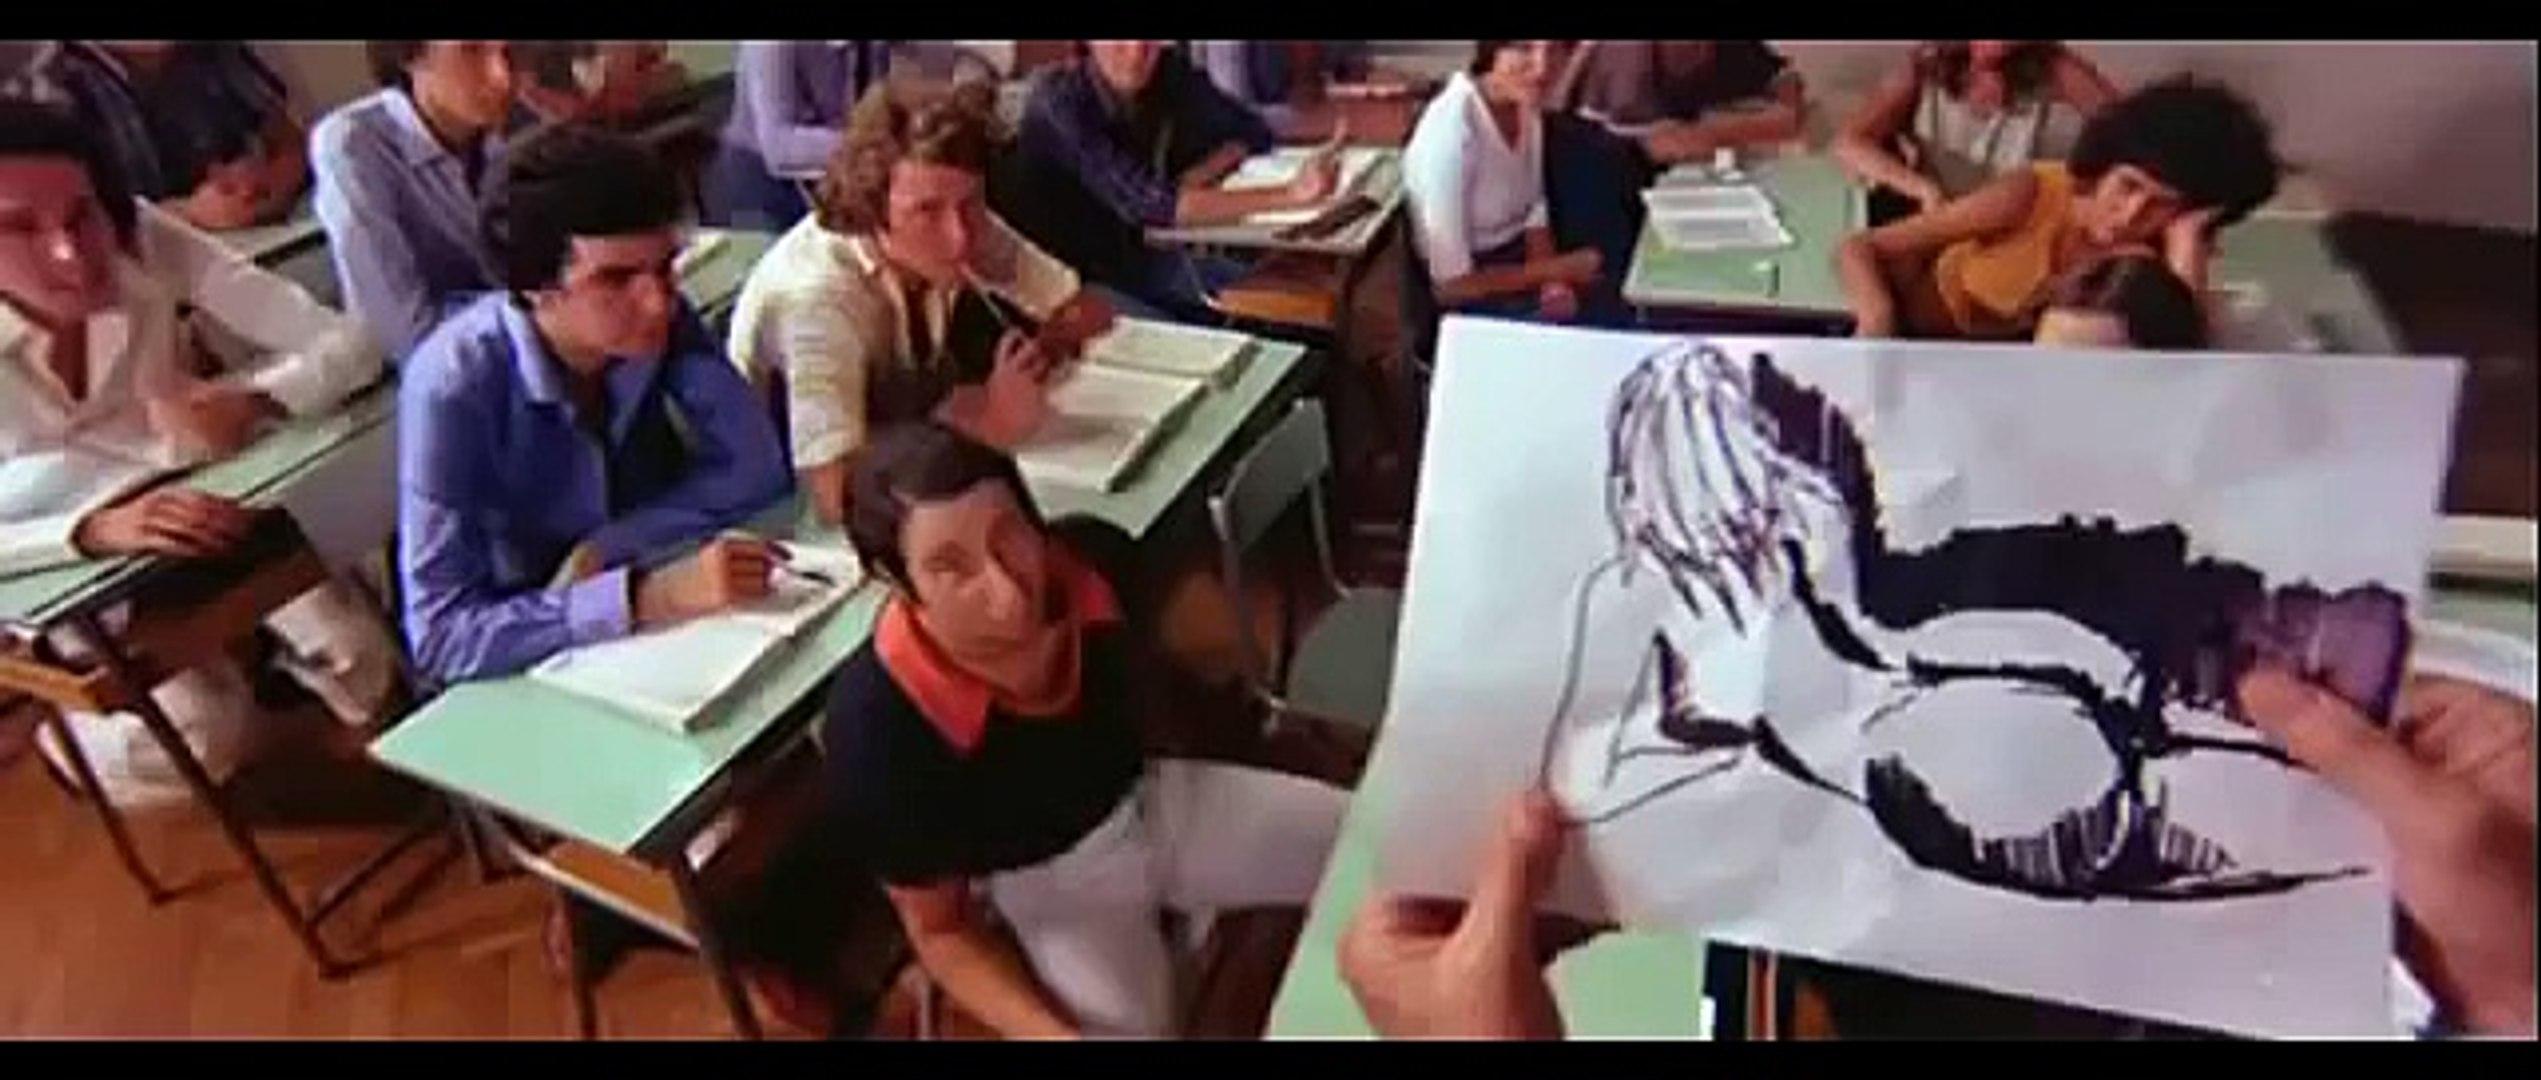 Funny Italian Movie Scene~ The Teasers (1975) & Malizia (1973 film)  Gloria Guida  Laura Antonel